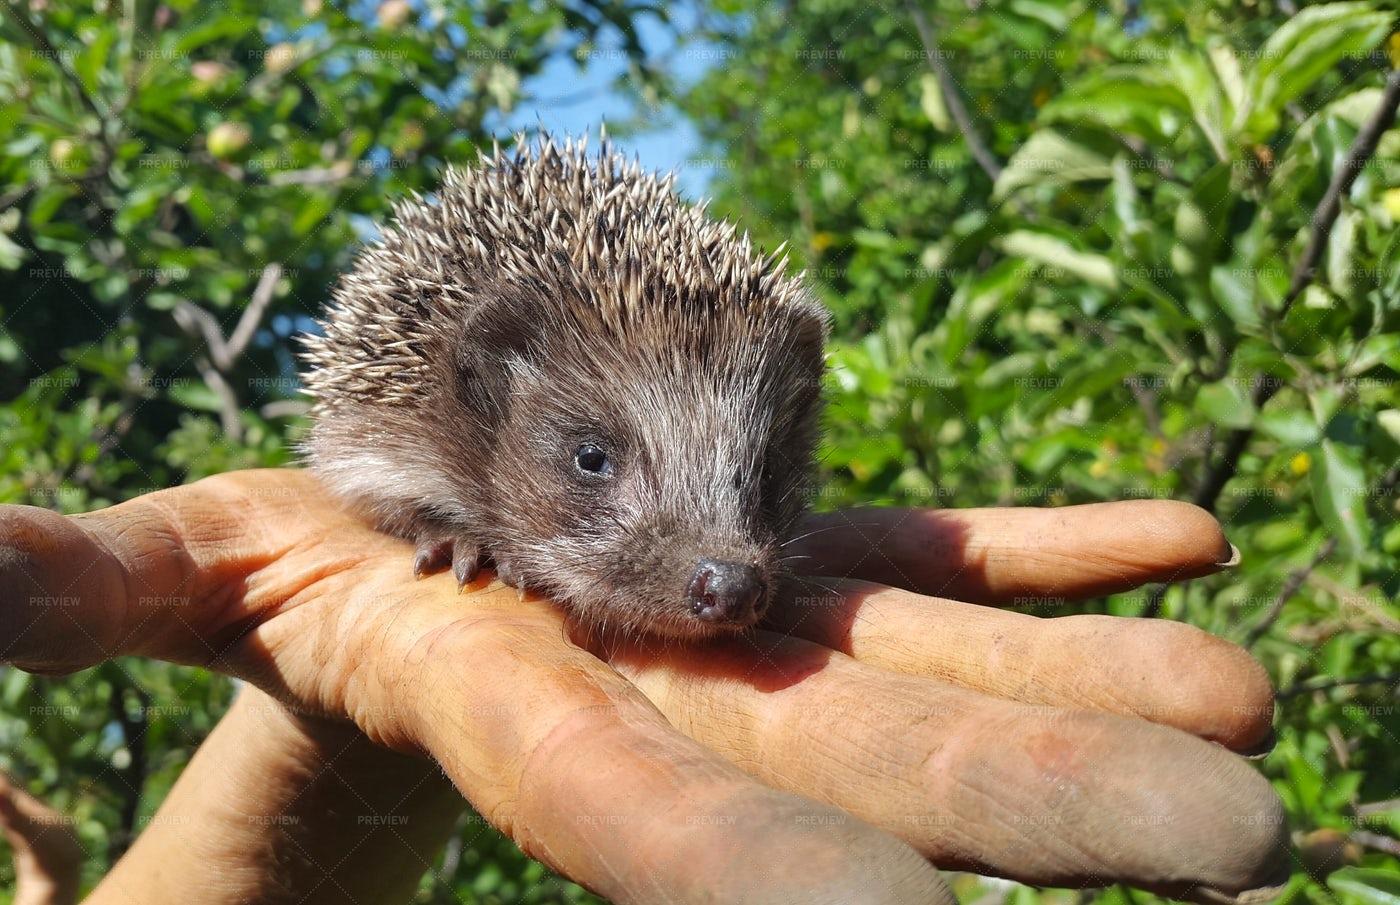 Hedgehog In Hand: Stock Photos